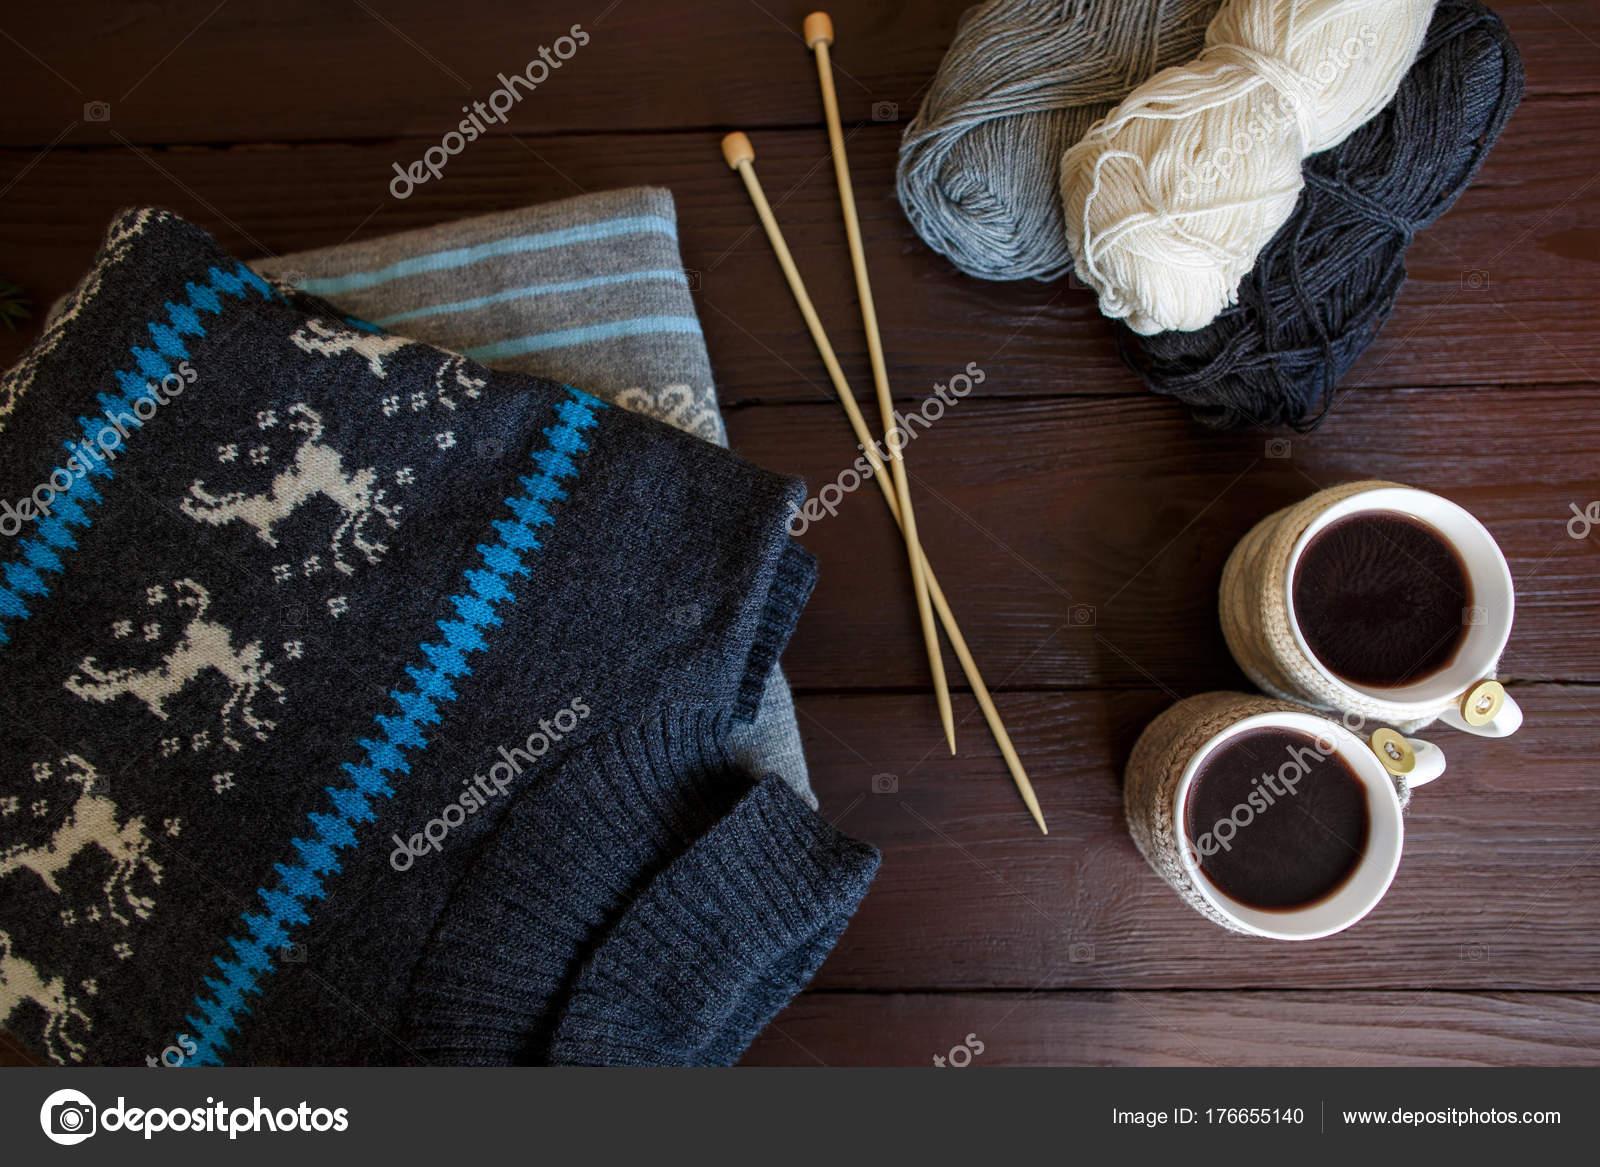 134855299bb Χειμερινά Αξεσουάρ: πλεκτά ενδύματα, δύο φλιτζάνια καφέ, μπάλες από νήματα  και βελόνες για